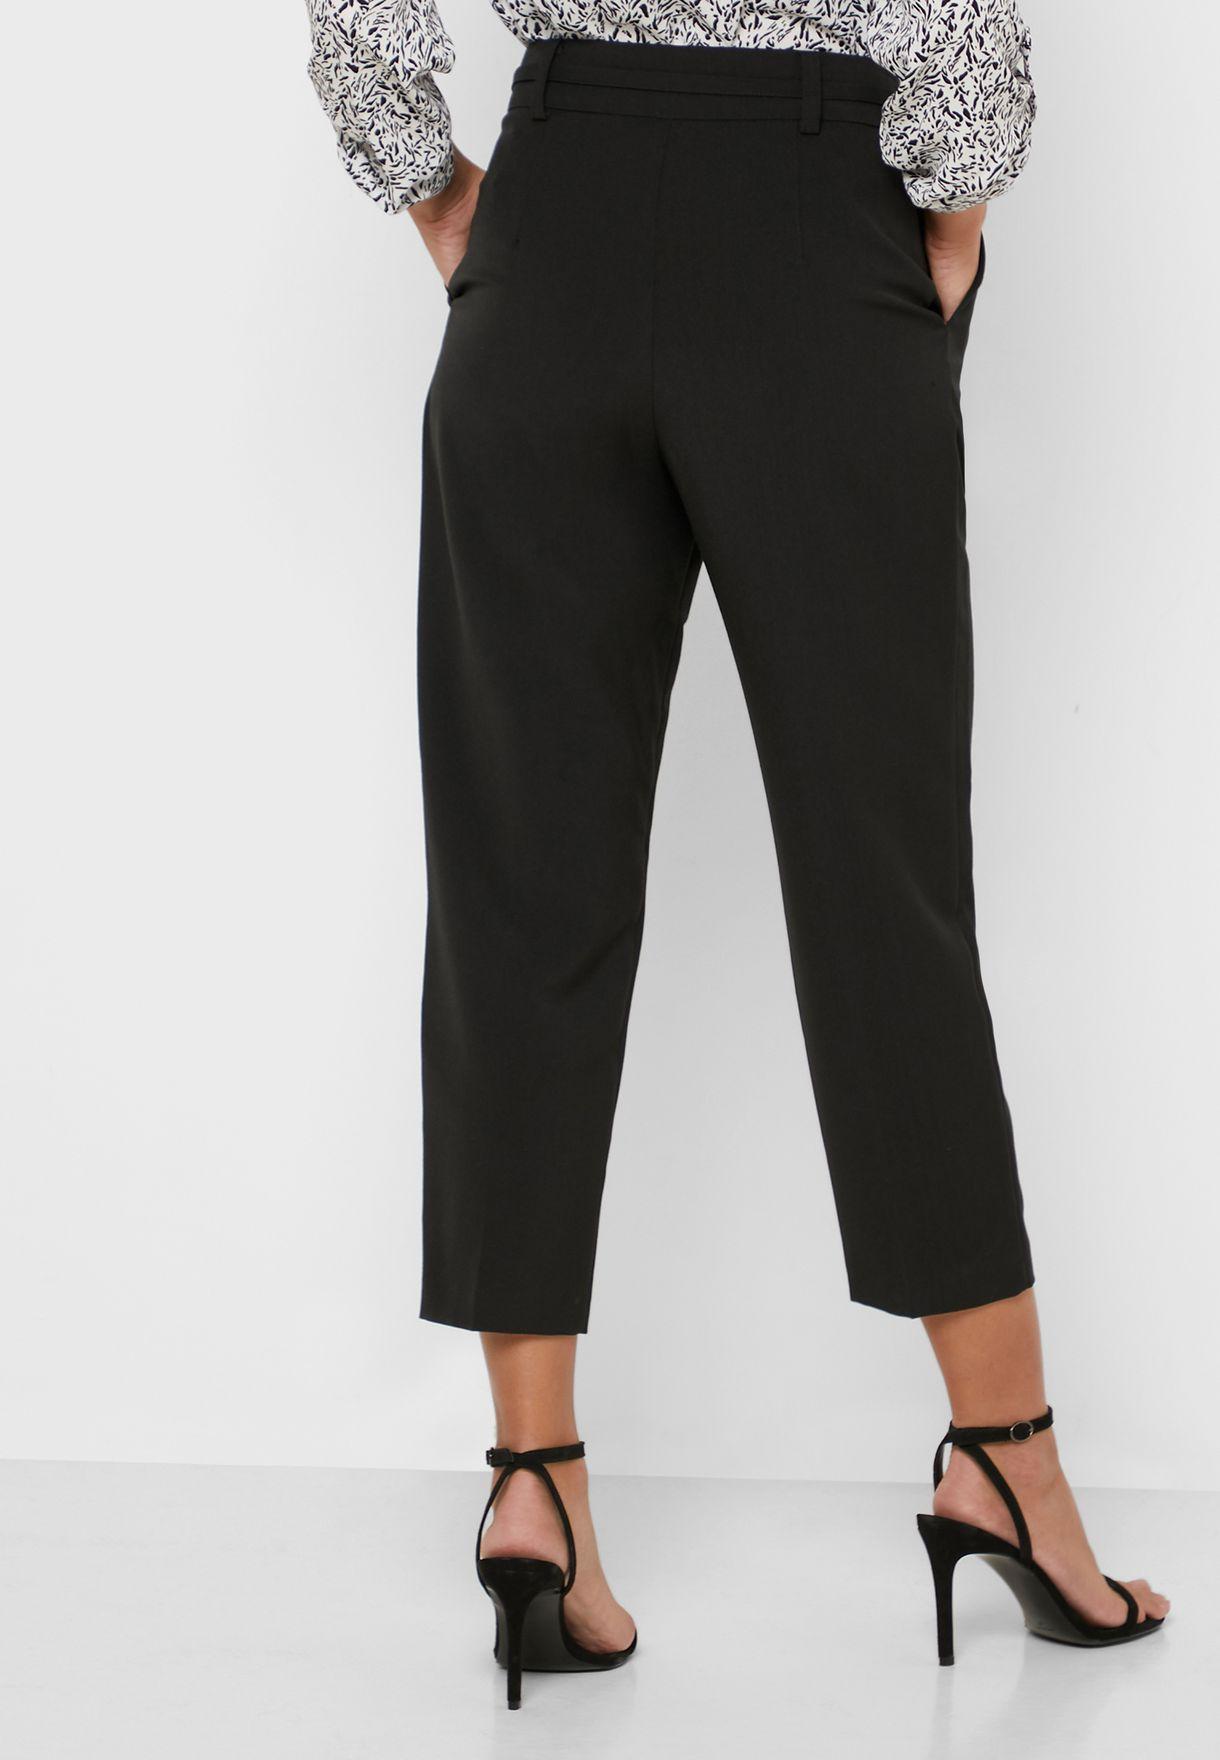 Belted Paperbag Waist Pants